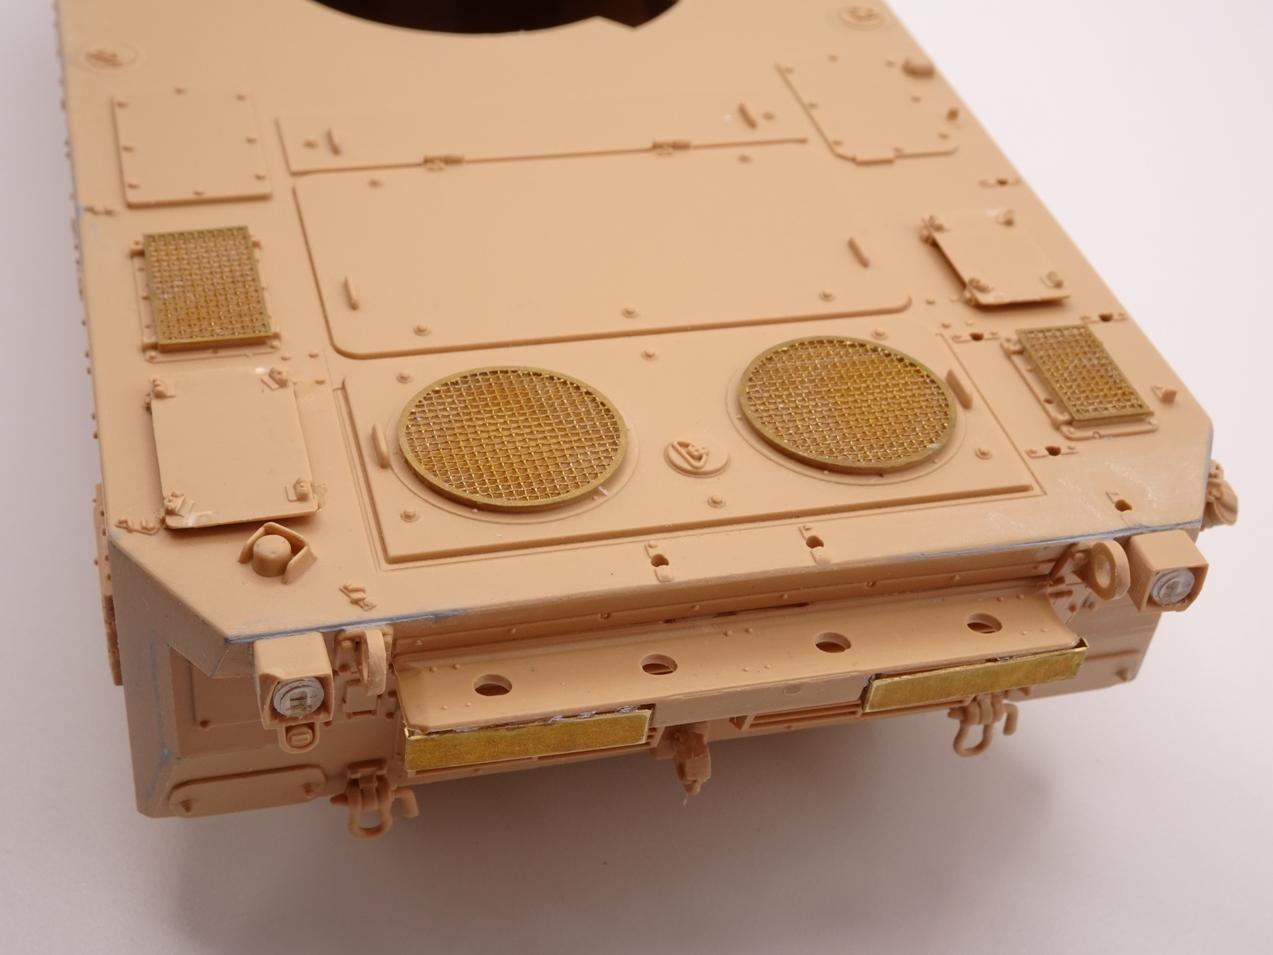 [Tiger Model] AMX-10RCR réf. 4602 - 1/35 - Page 2 Amx10-1407-3